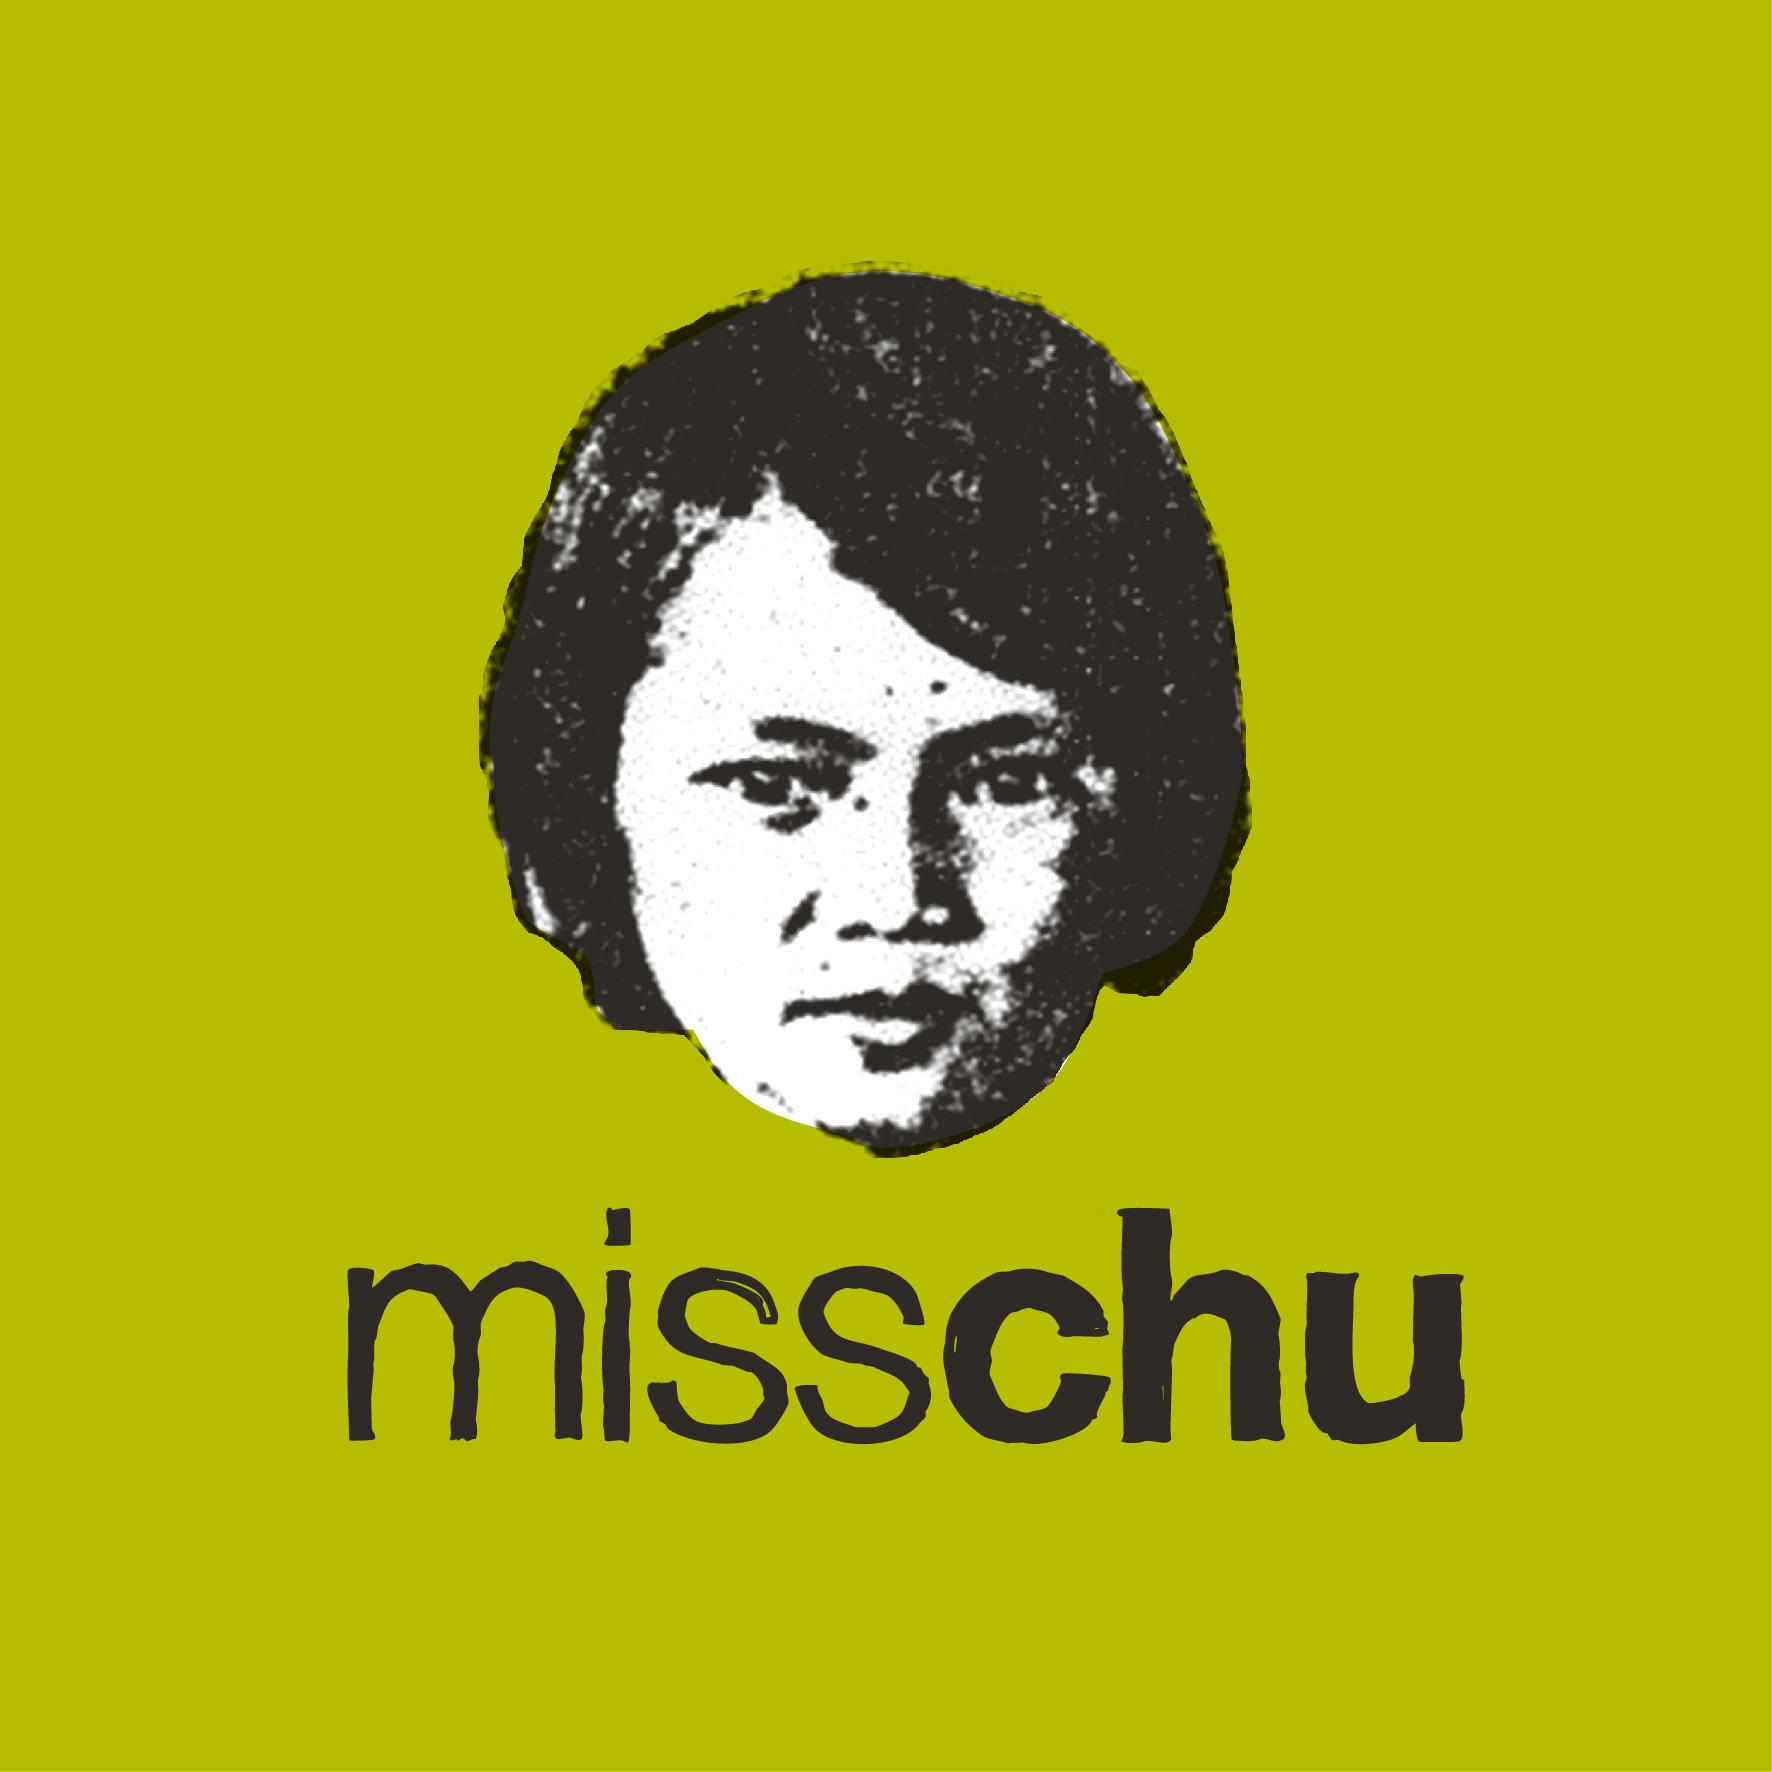 misschu the original Asian street-food 'tuckshop' - New franchise Ballarat